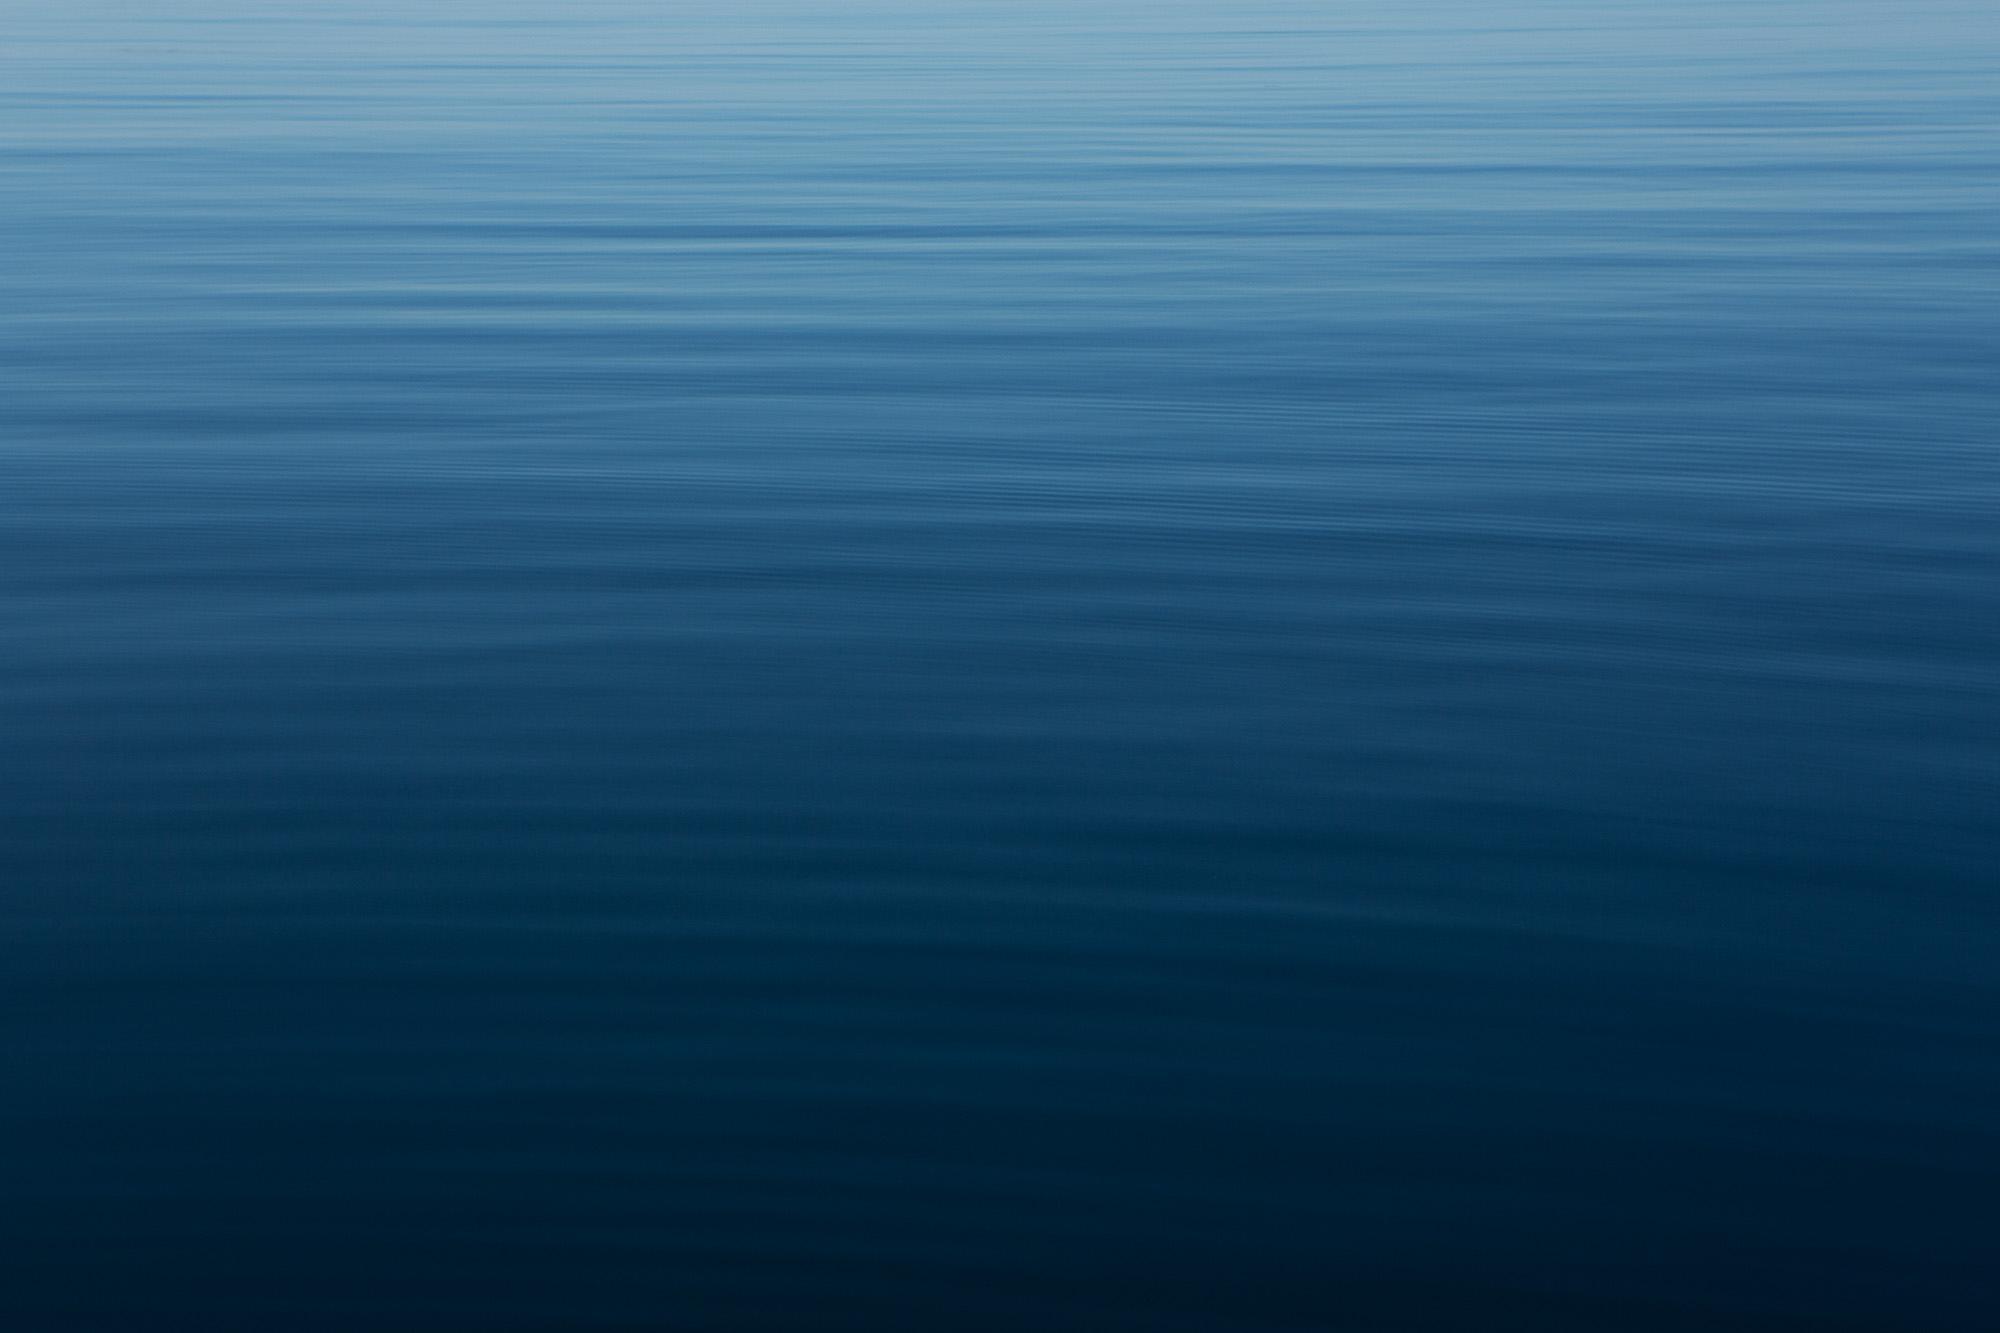 Water V, 2014